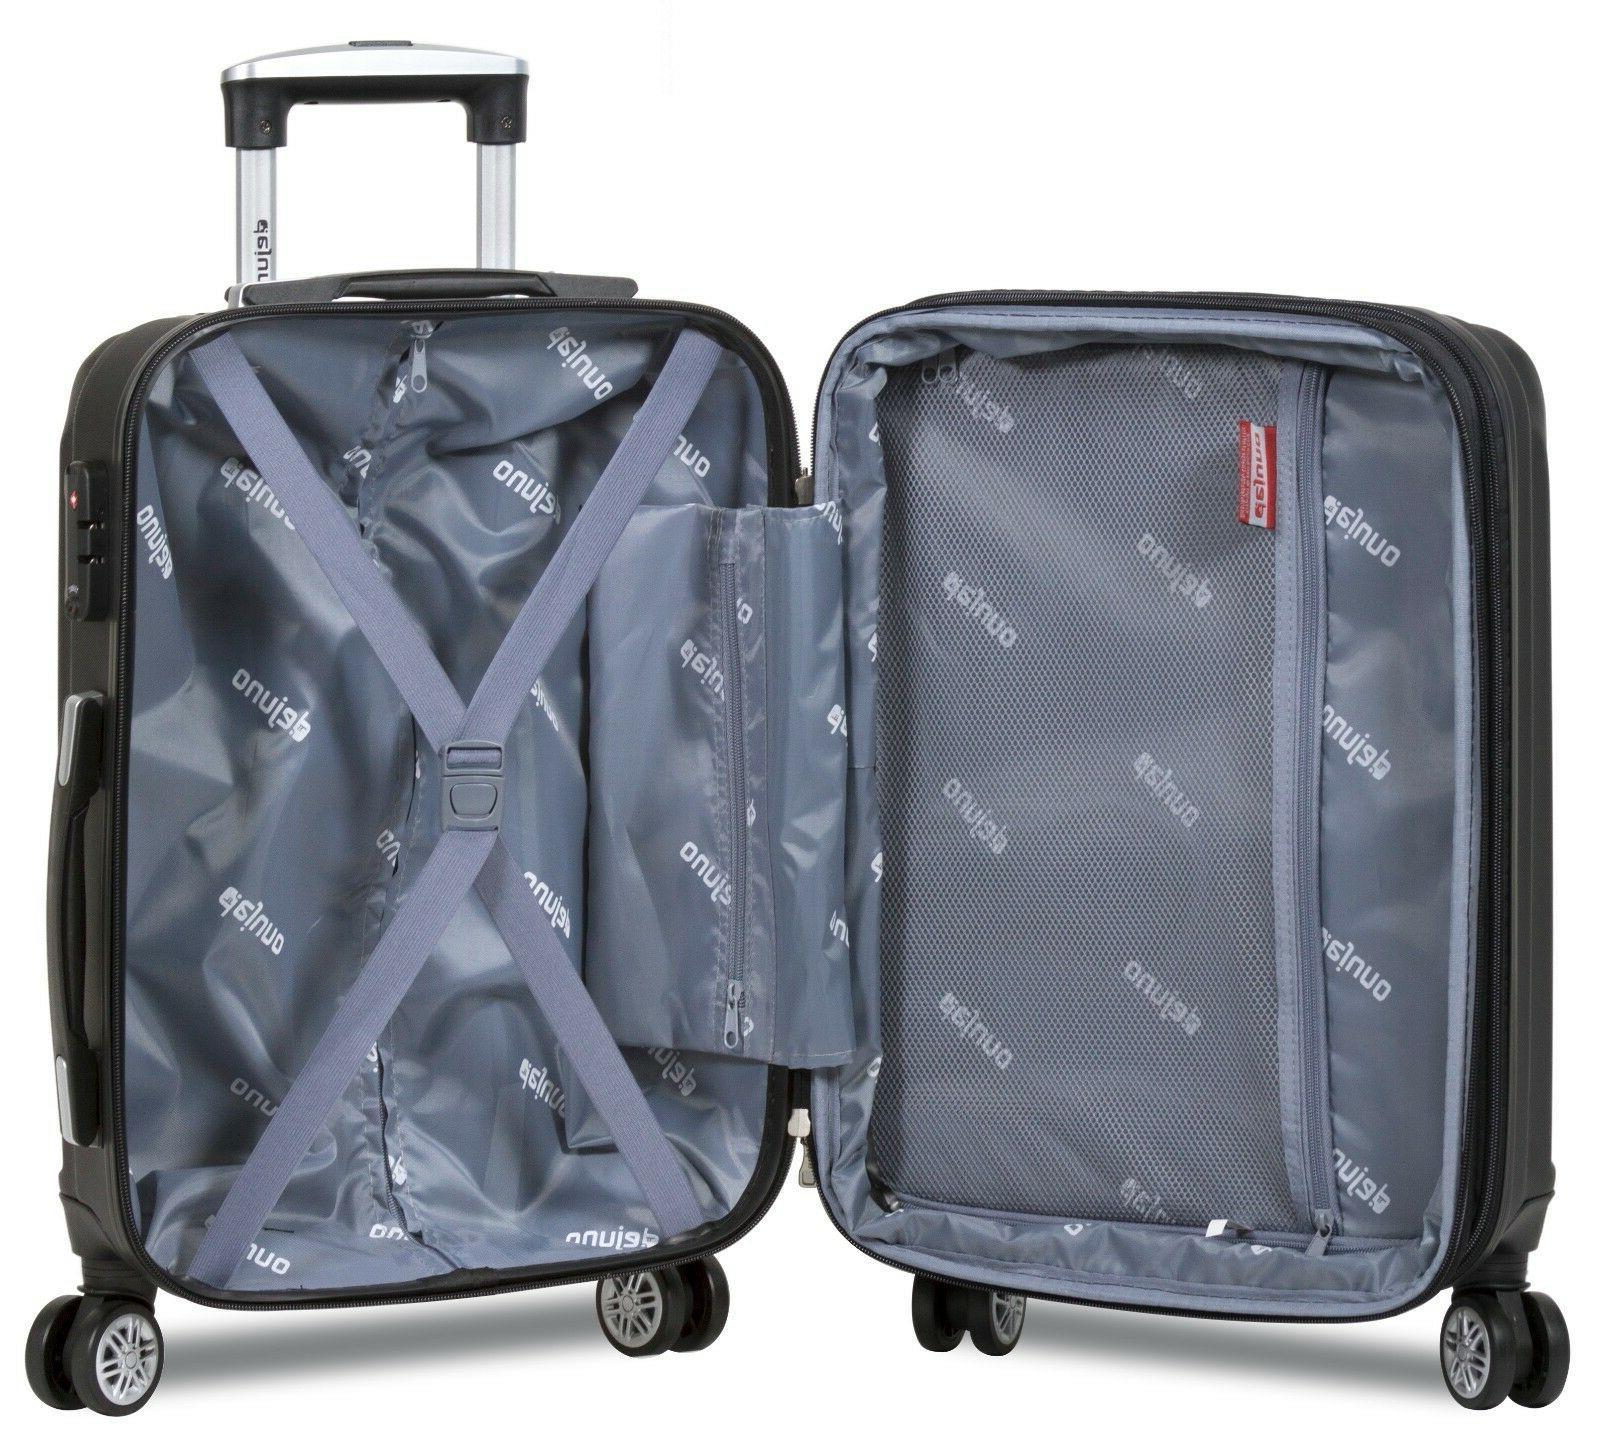 Black Case 3PC Rolling Luggage